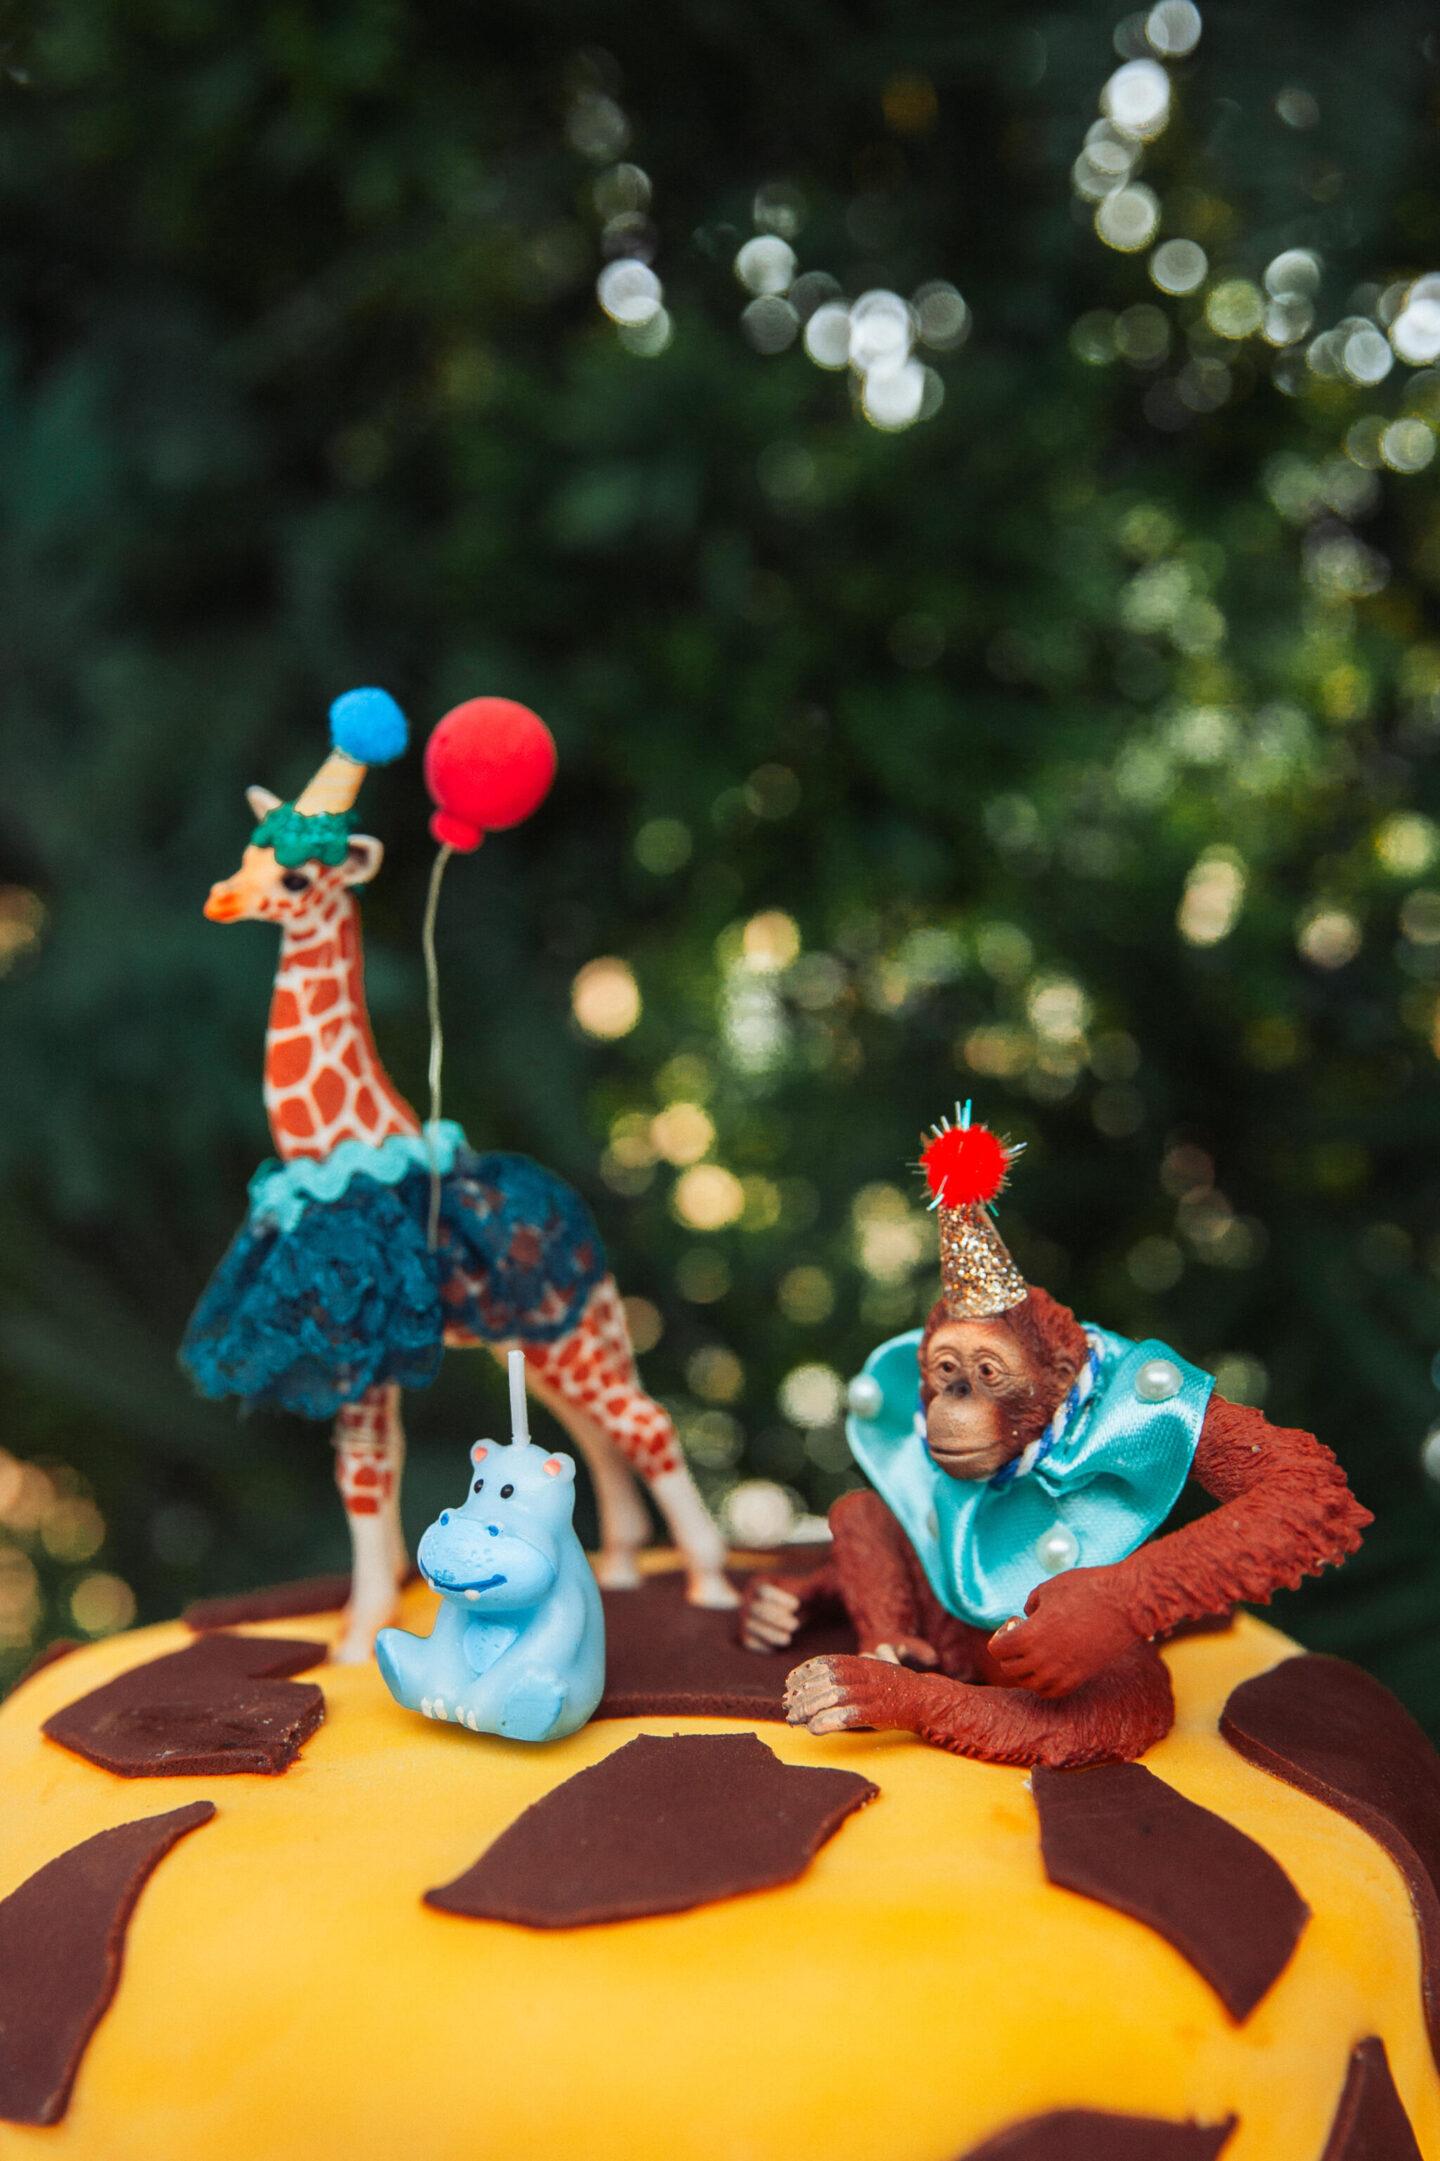 giraffe_Orangutan_Cake_Topper